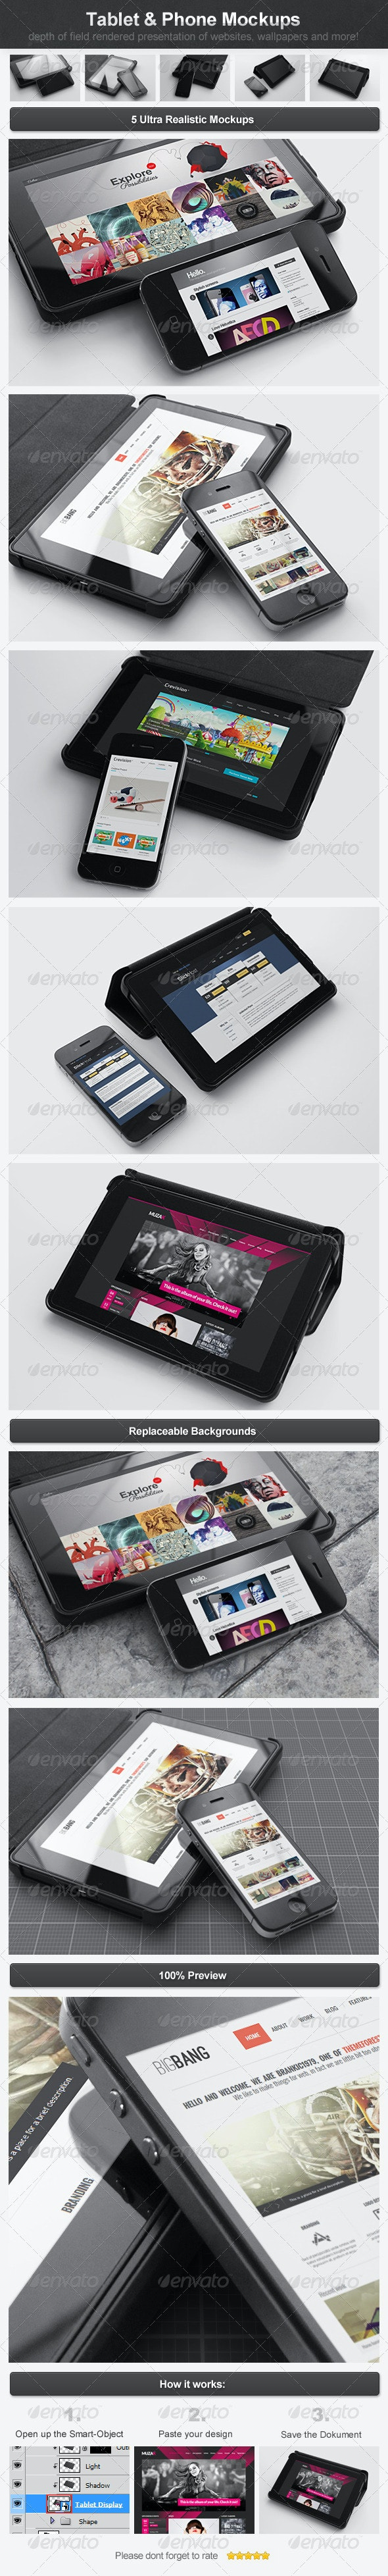 Tablet & Phone Mockups - Multiple Displays